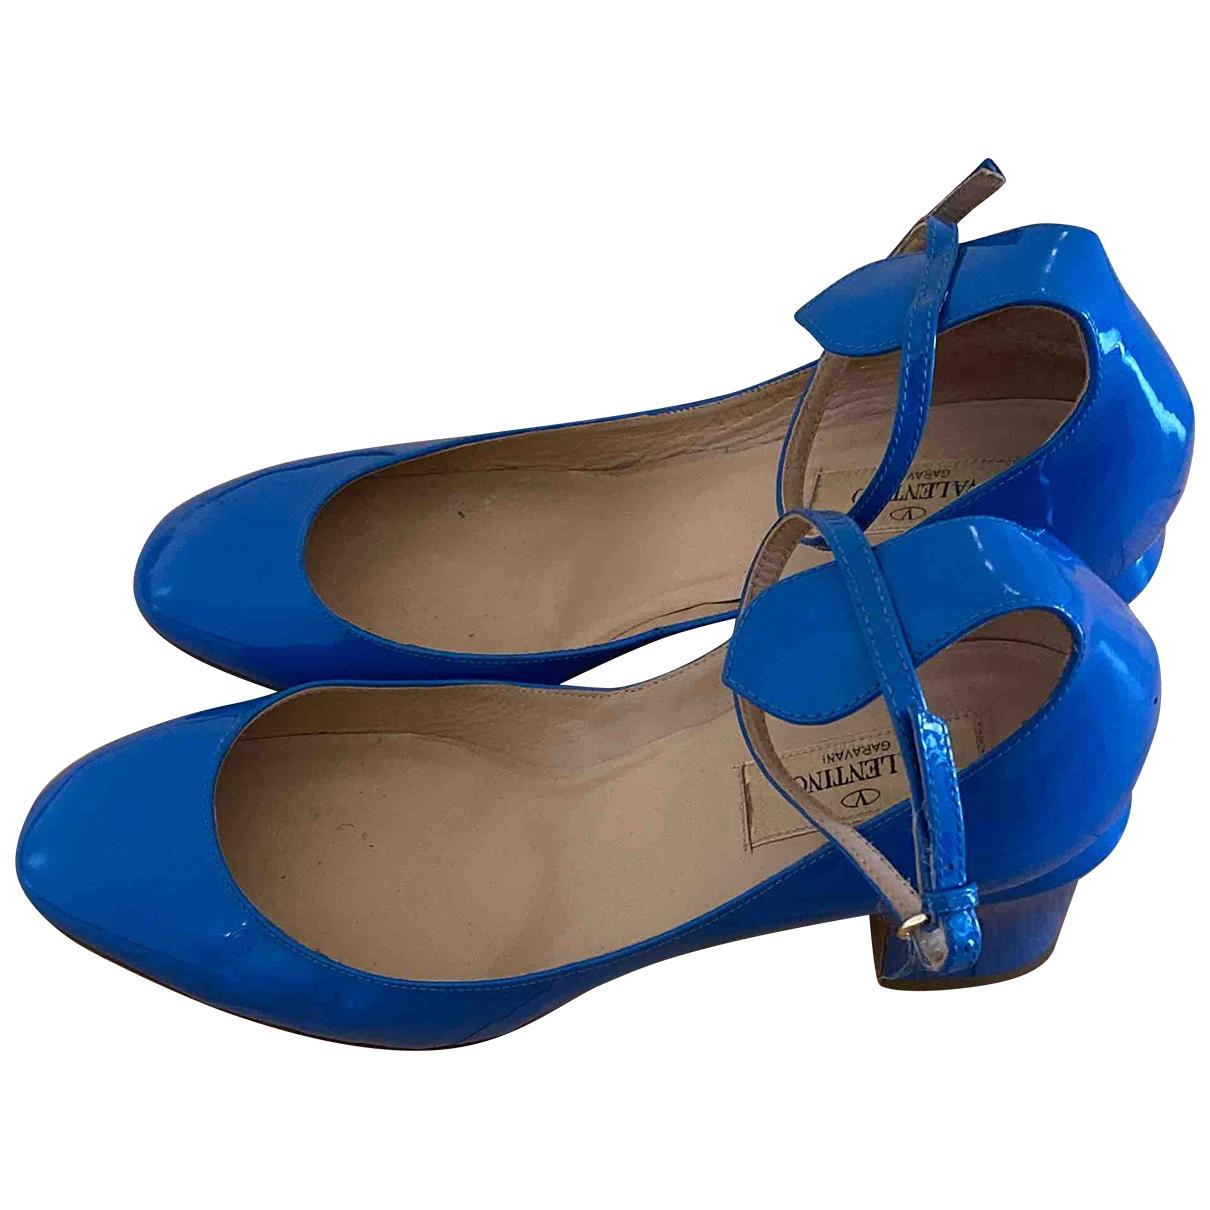 Valentino Garavani - Escarpins Tango pour femme en cuir verni - bleu